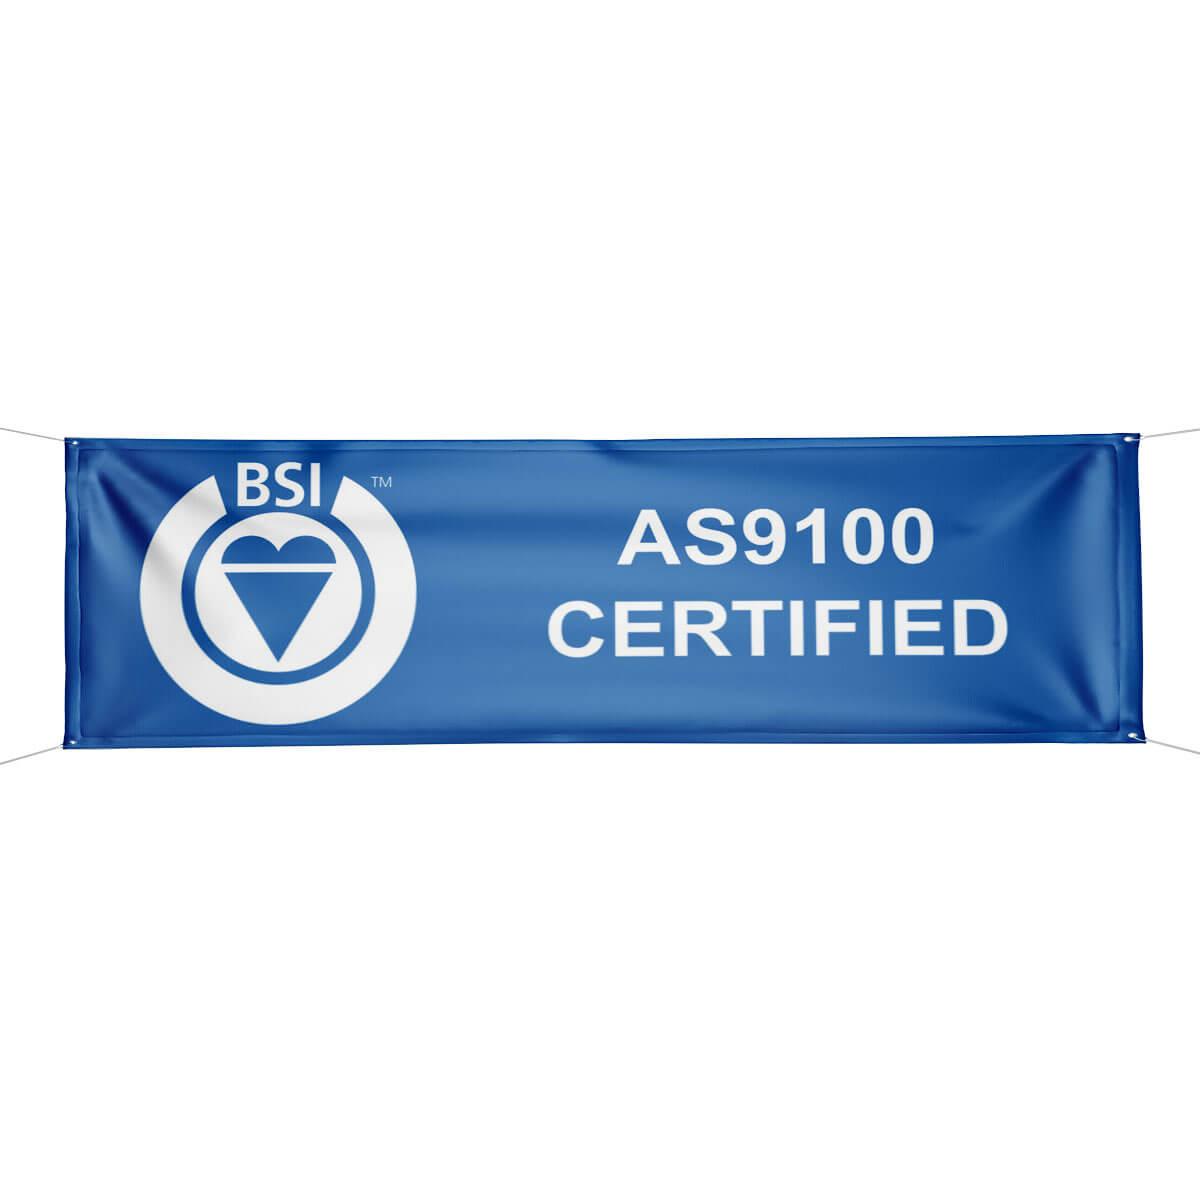 Bsi As9100 Certified Banner